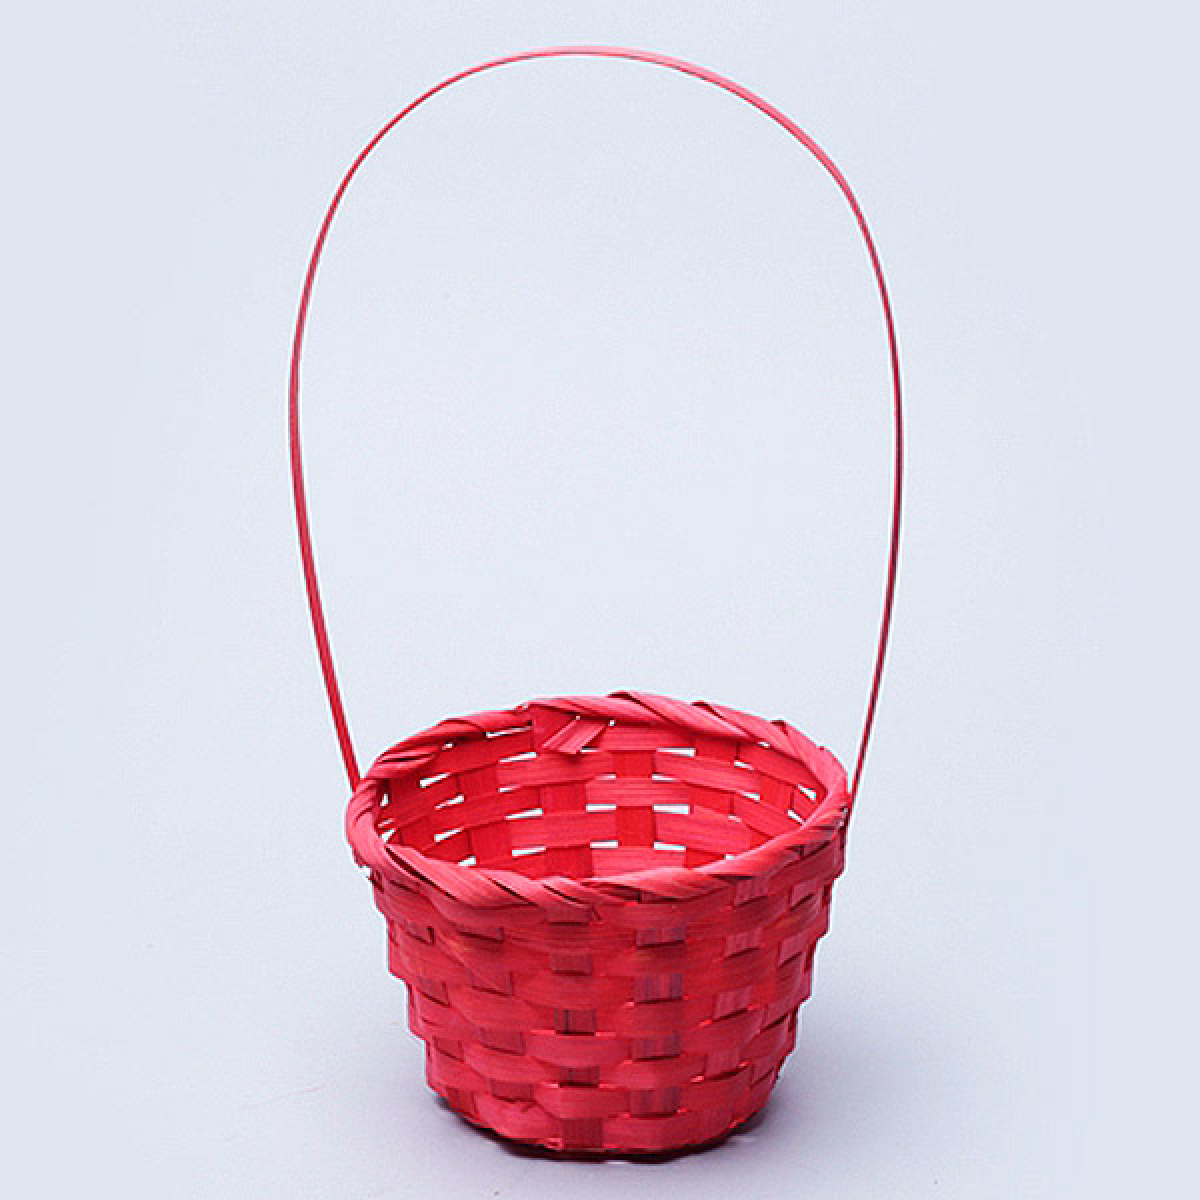 47852 Корзина плетеная бамбук D13*9.5/28см красная